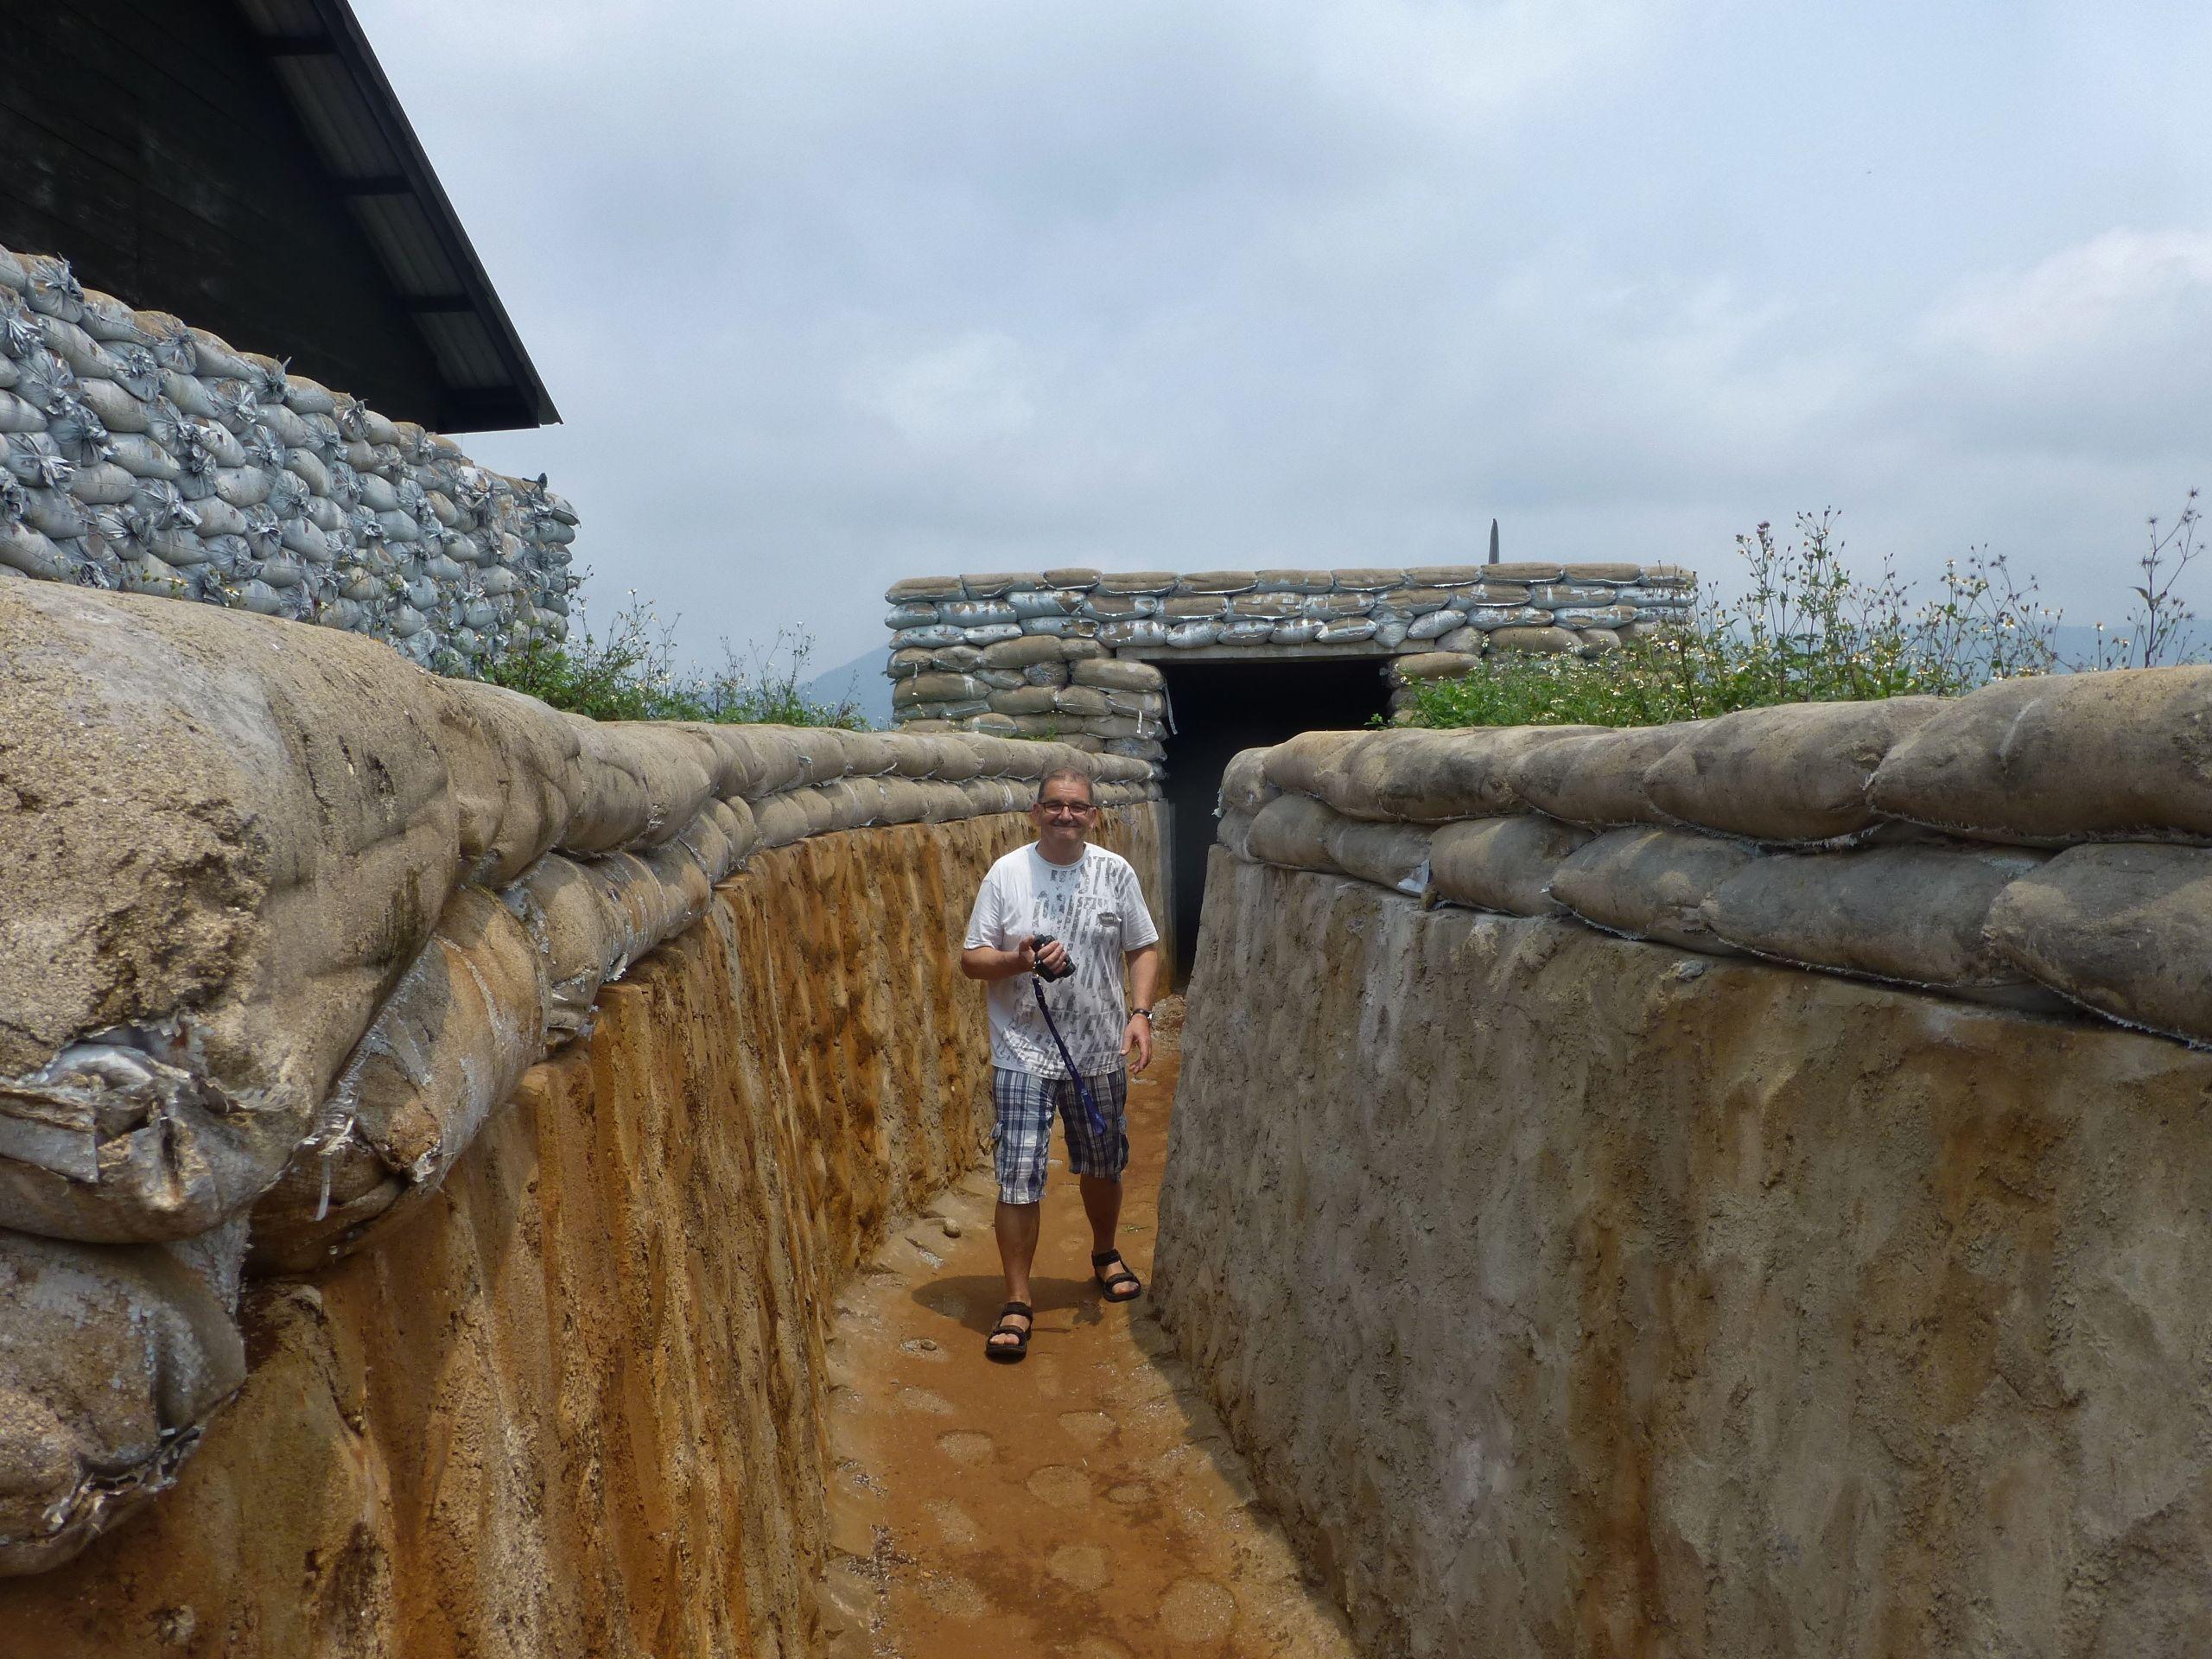 Vinh moc tunnels quang tri vietnam www asianatravelmate com viet